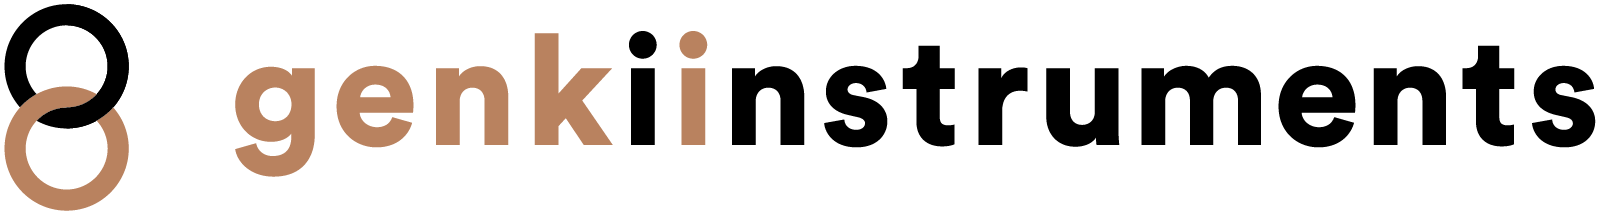 genki_instruments_primary_logo.png